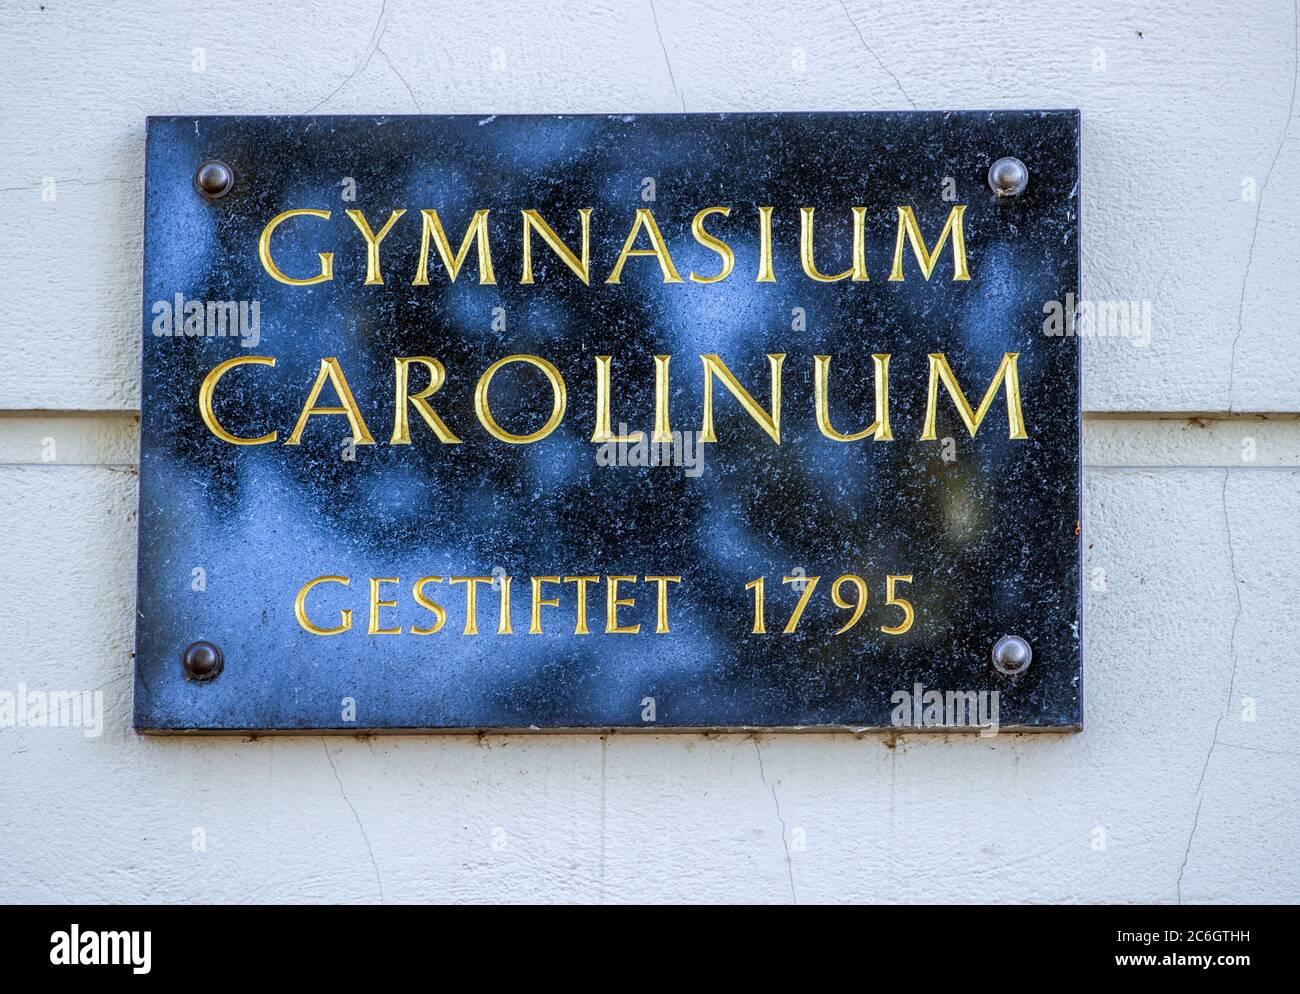 Neustrelitz, Germany. 23rd June, 2020. The door sign at the Gymnasium Carolinum donated 1795 in Neustrelitz. Credit: Jens Büttner/dpa-Zentralbild/ZB/dpa/Alamy Live News Stock Photo